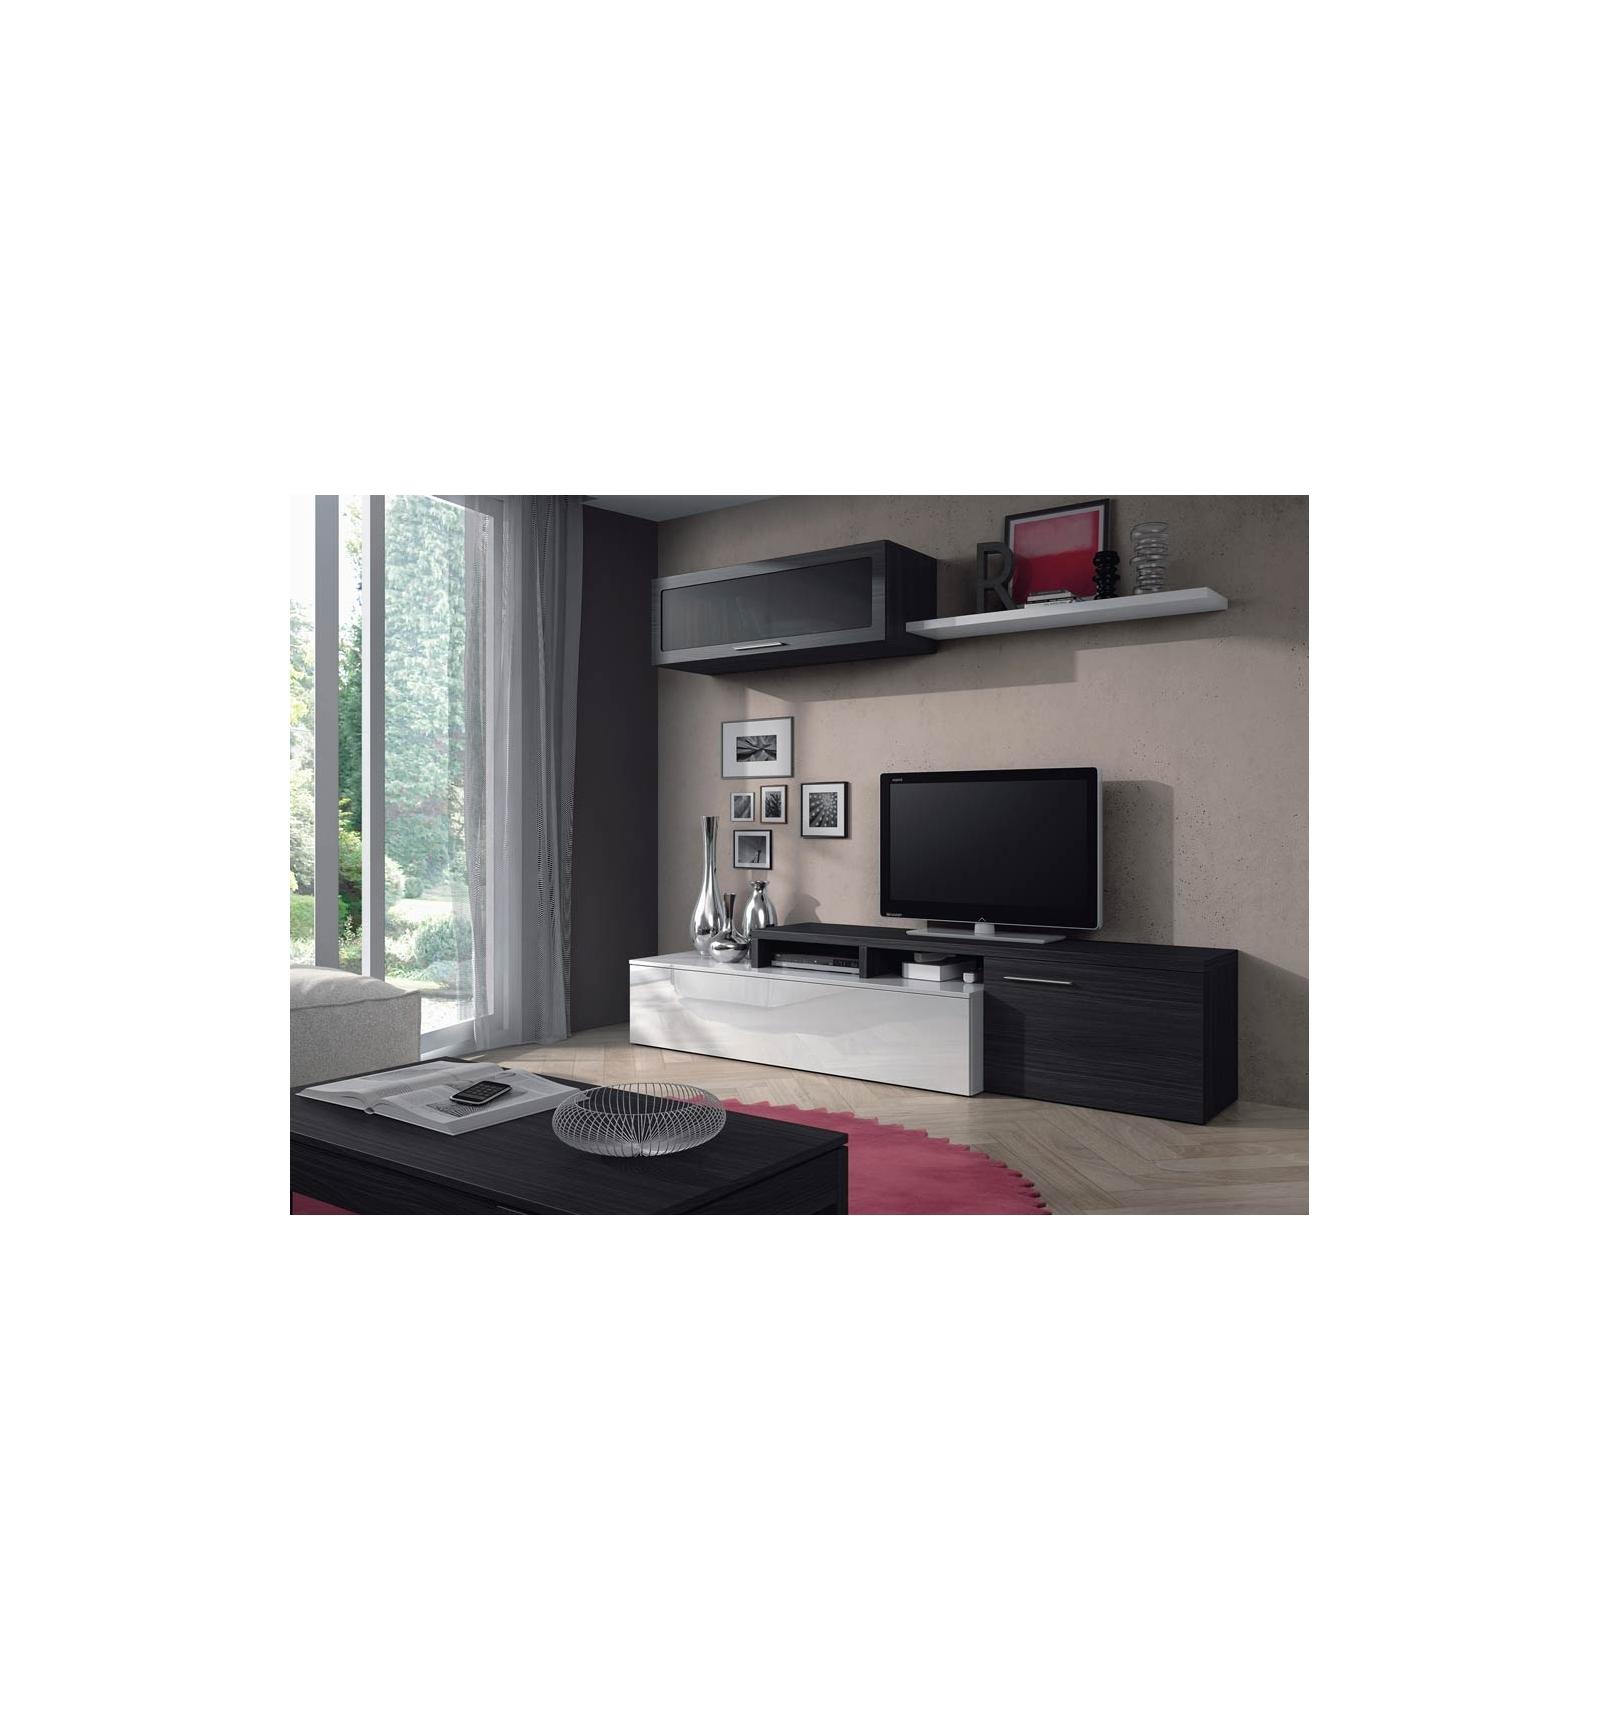 Mueble compacto for Mueble compacto tv